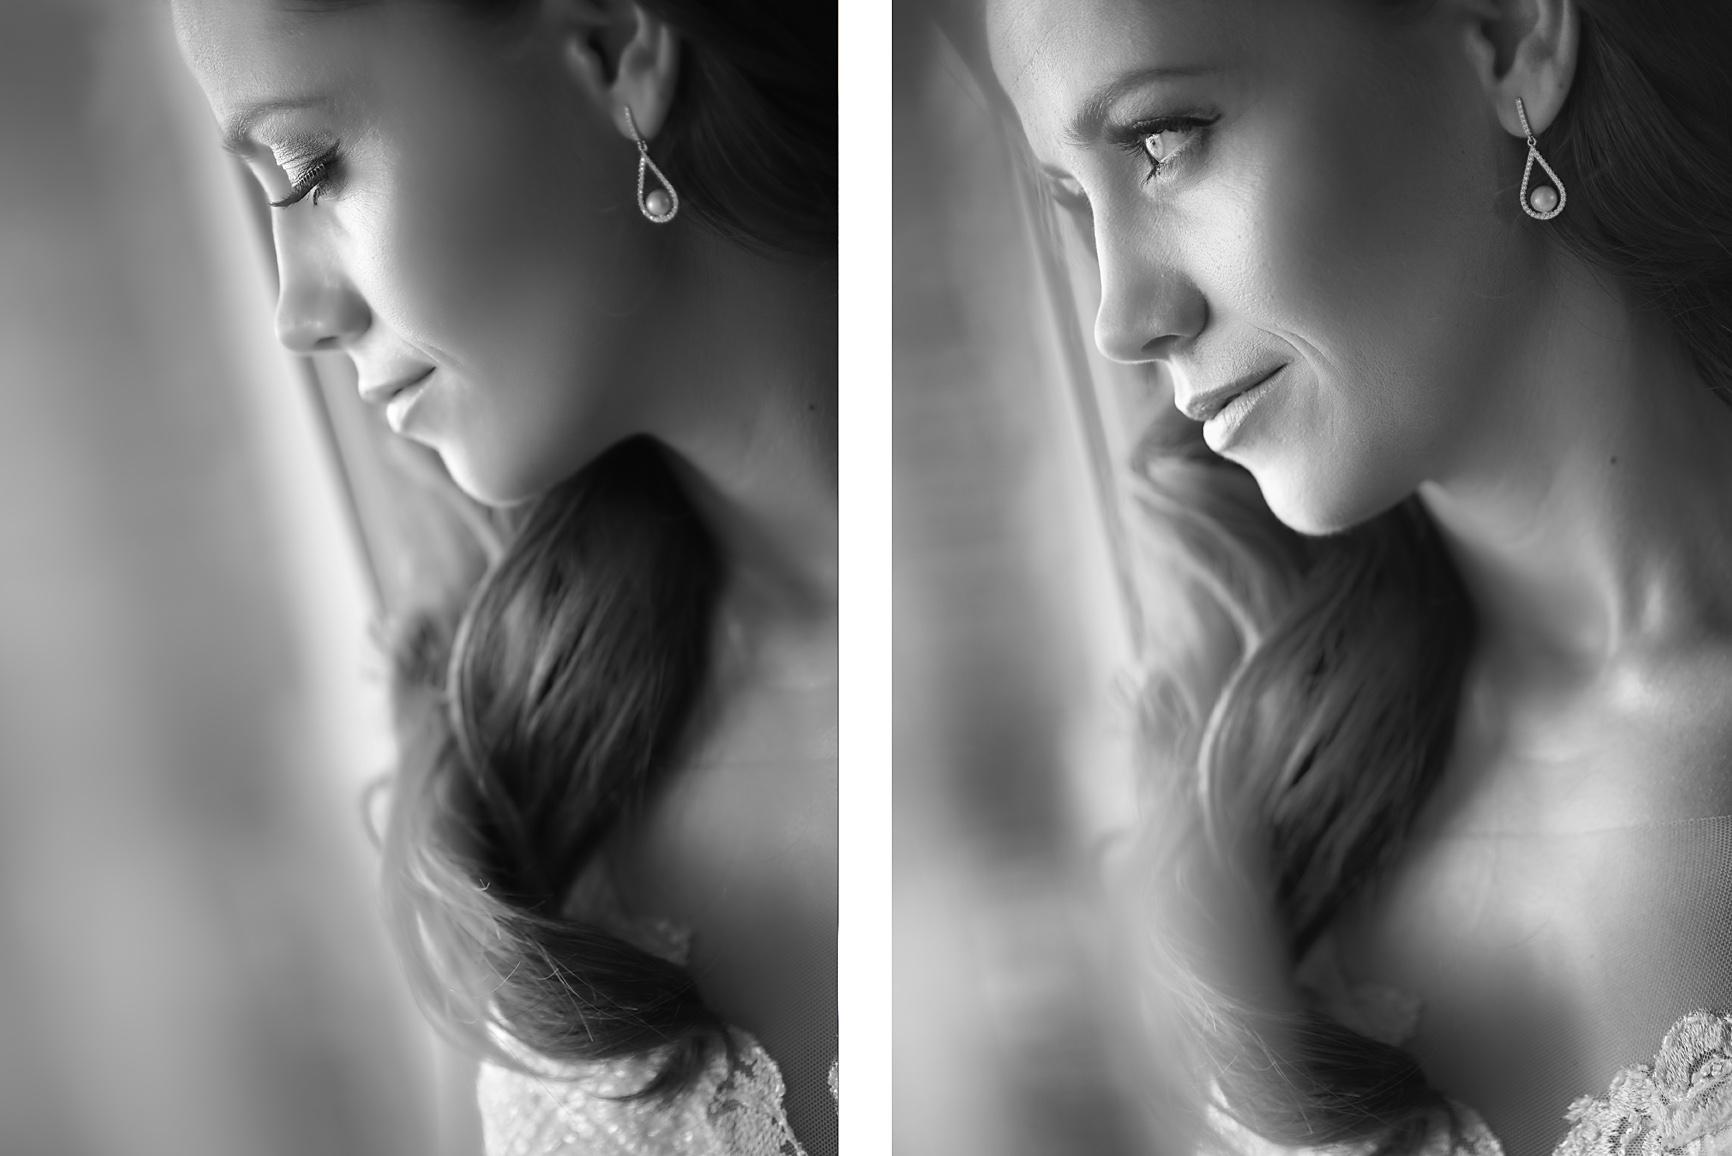 bride-beauty-wedding-dress-larissa-preparation-hotel-cavoolymbus-alexis-koumaditis-photography